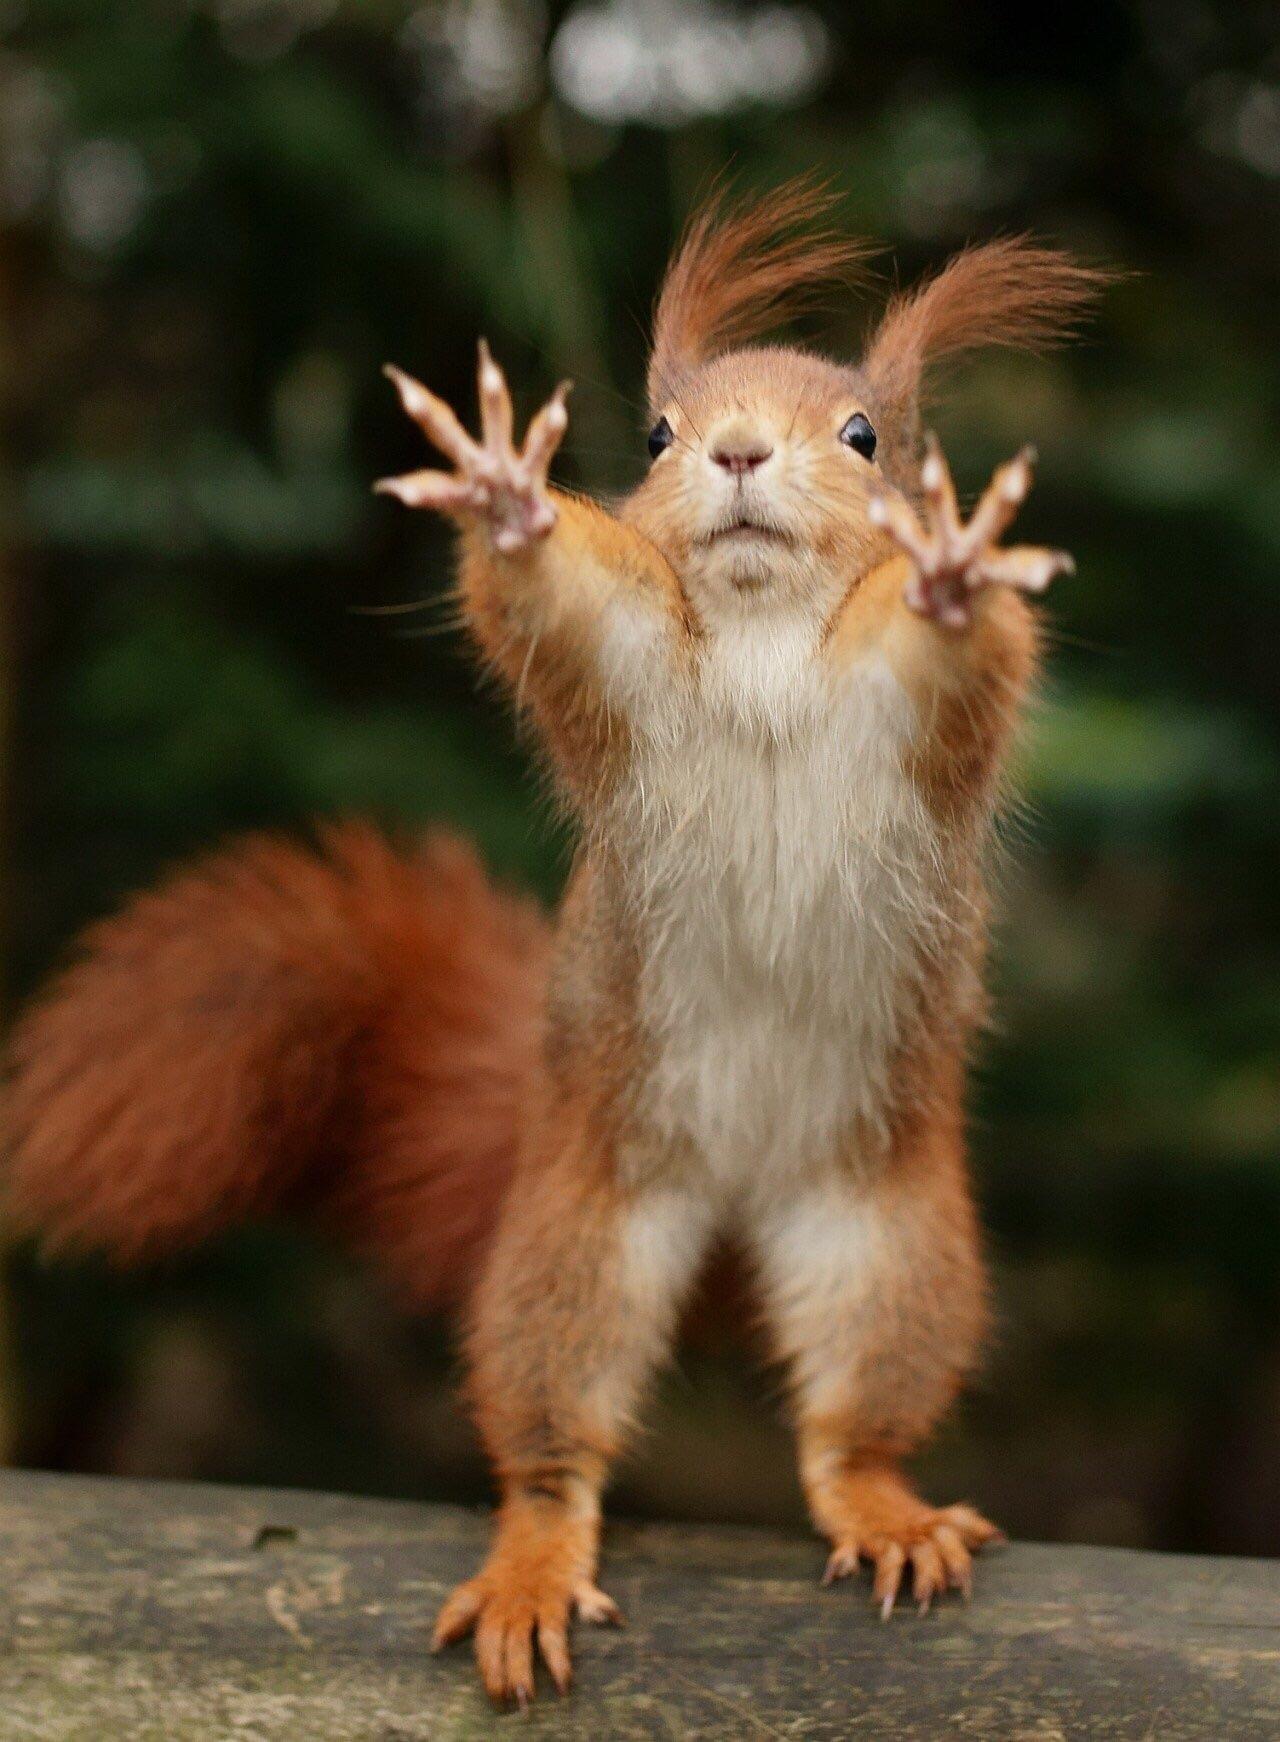 Psbattle This Red Squirrel